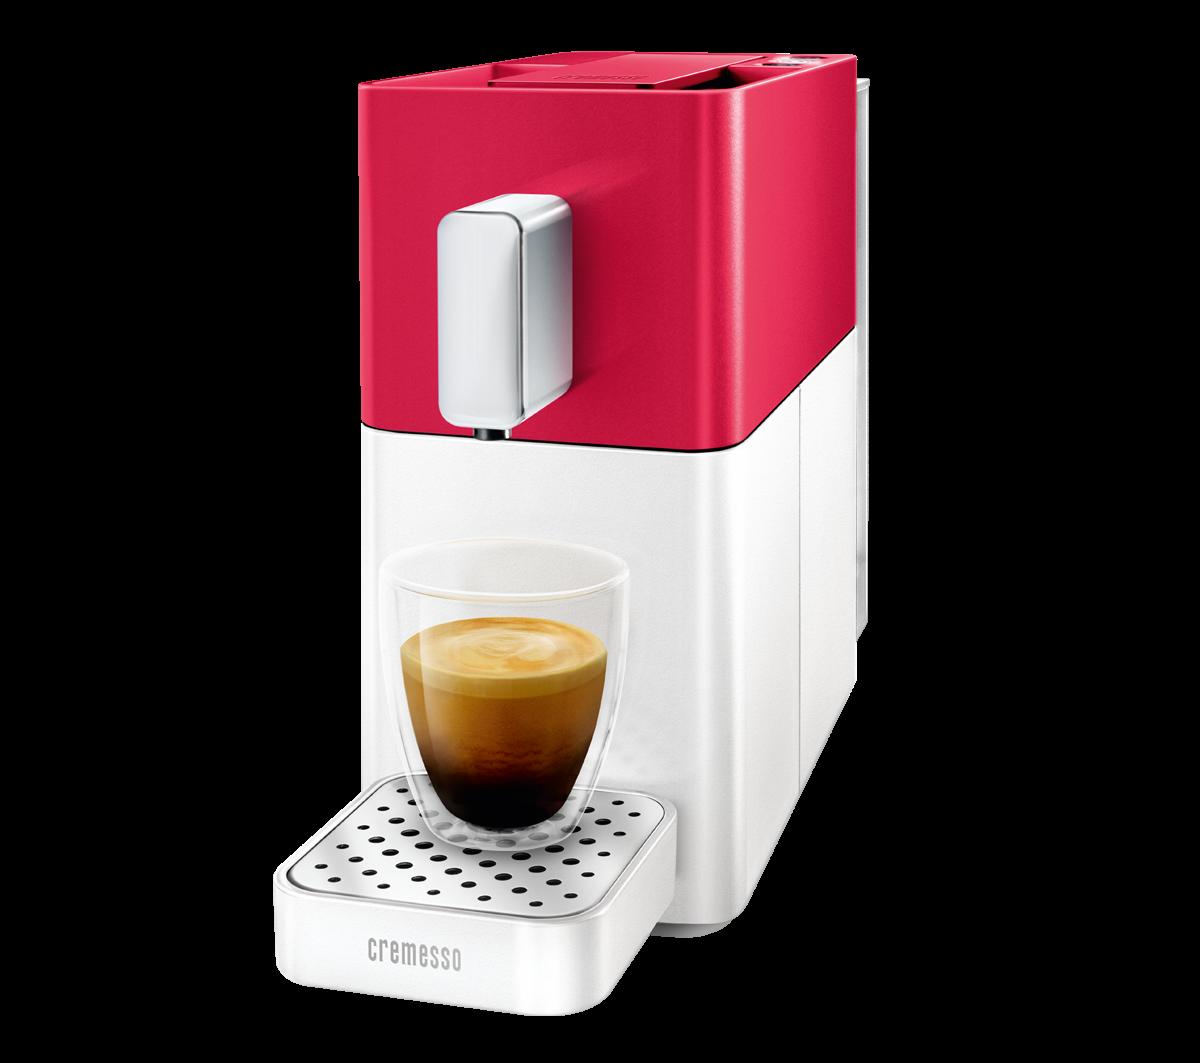 Cremesso Easy Kaffeemaschine Cremesso